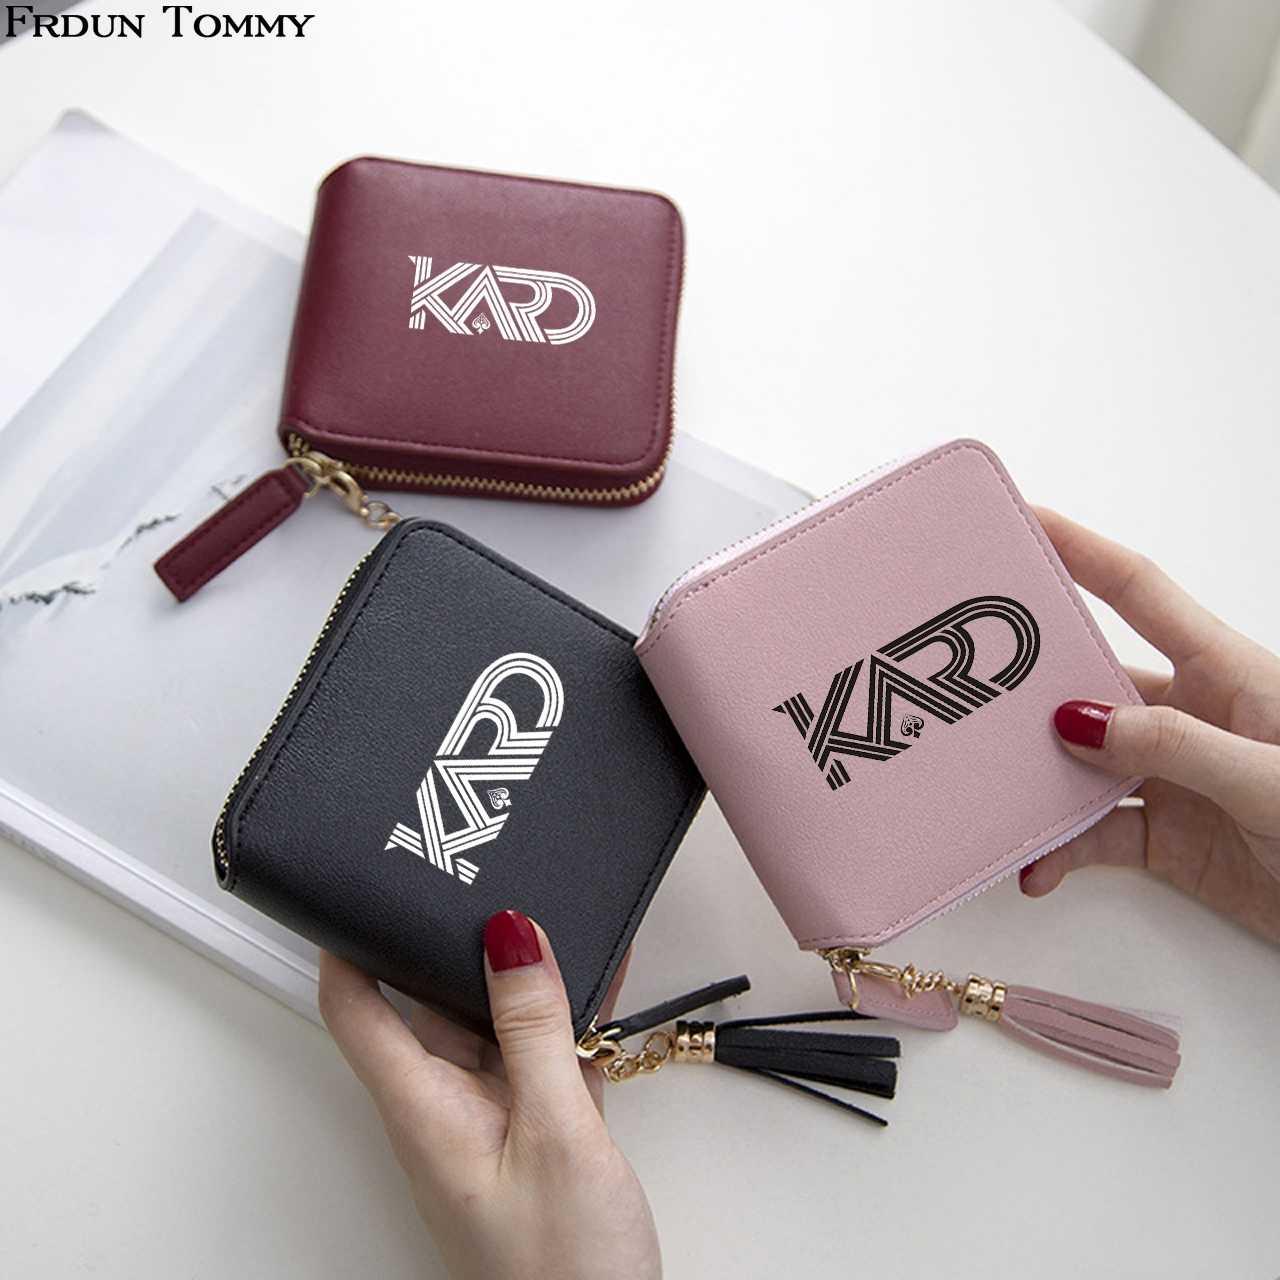 Kard Wallet Kpop Mini Short Zipper Card BM 3D PU Leather Wallets